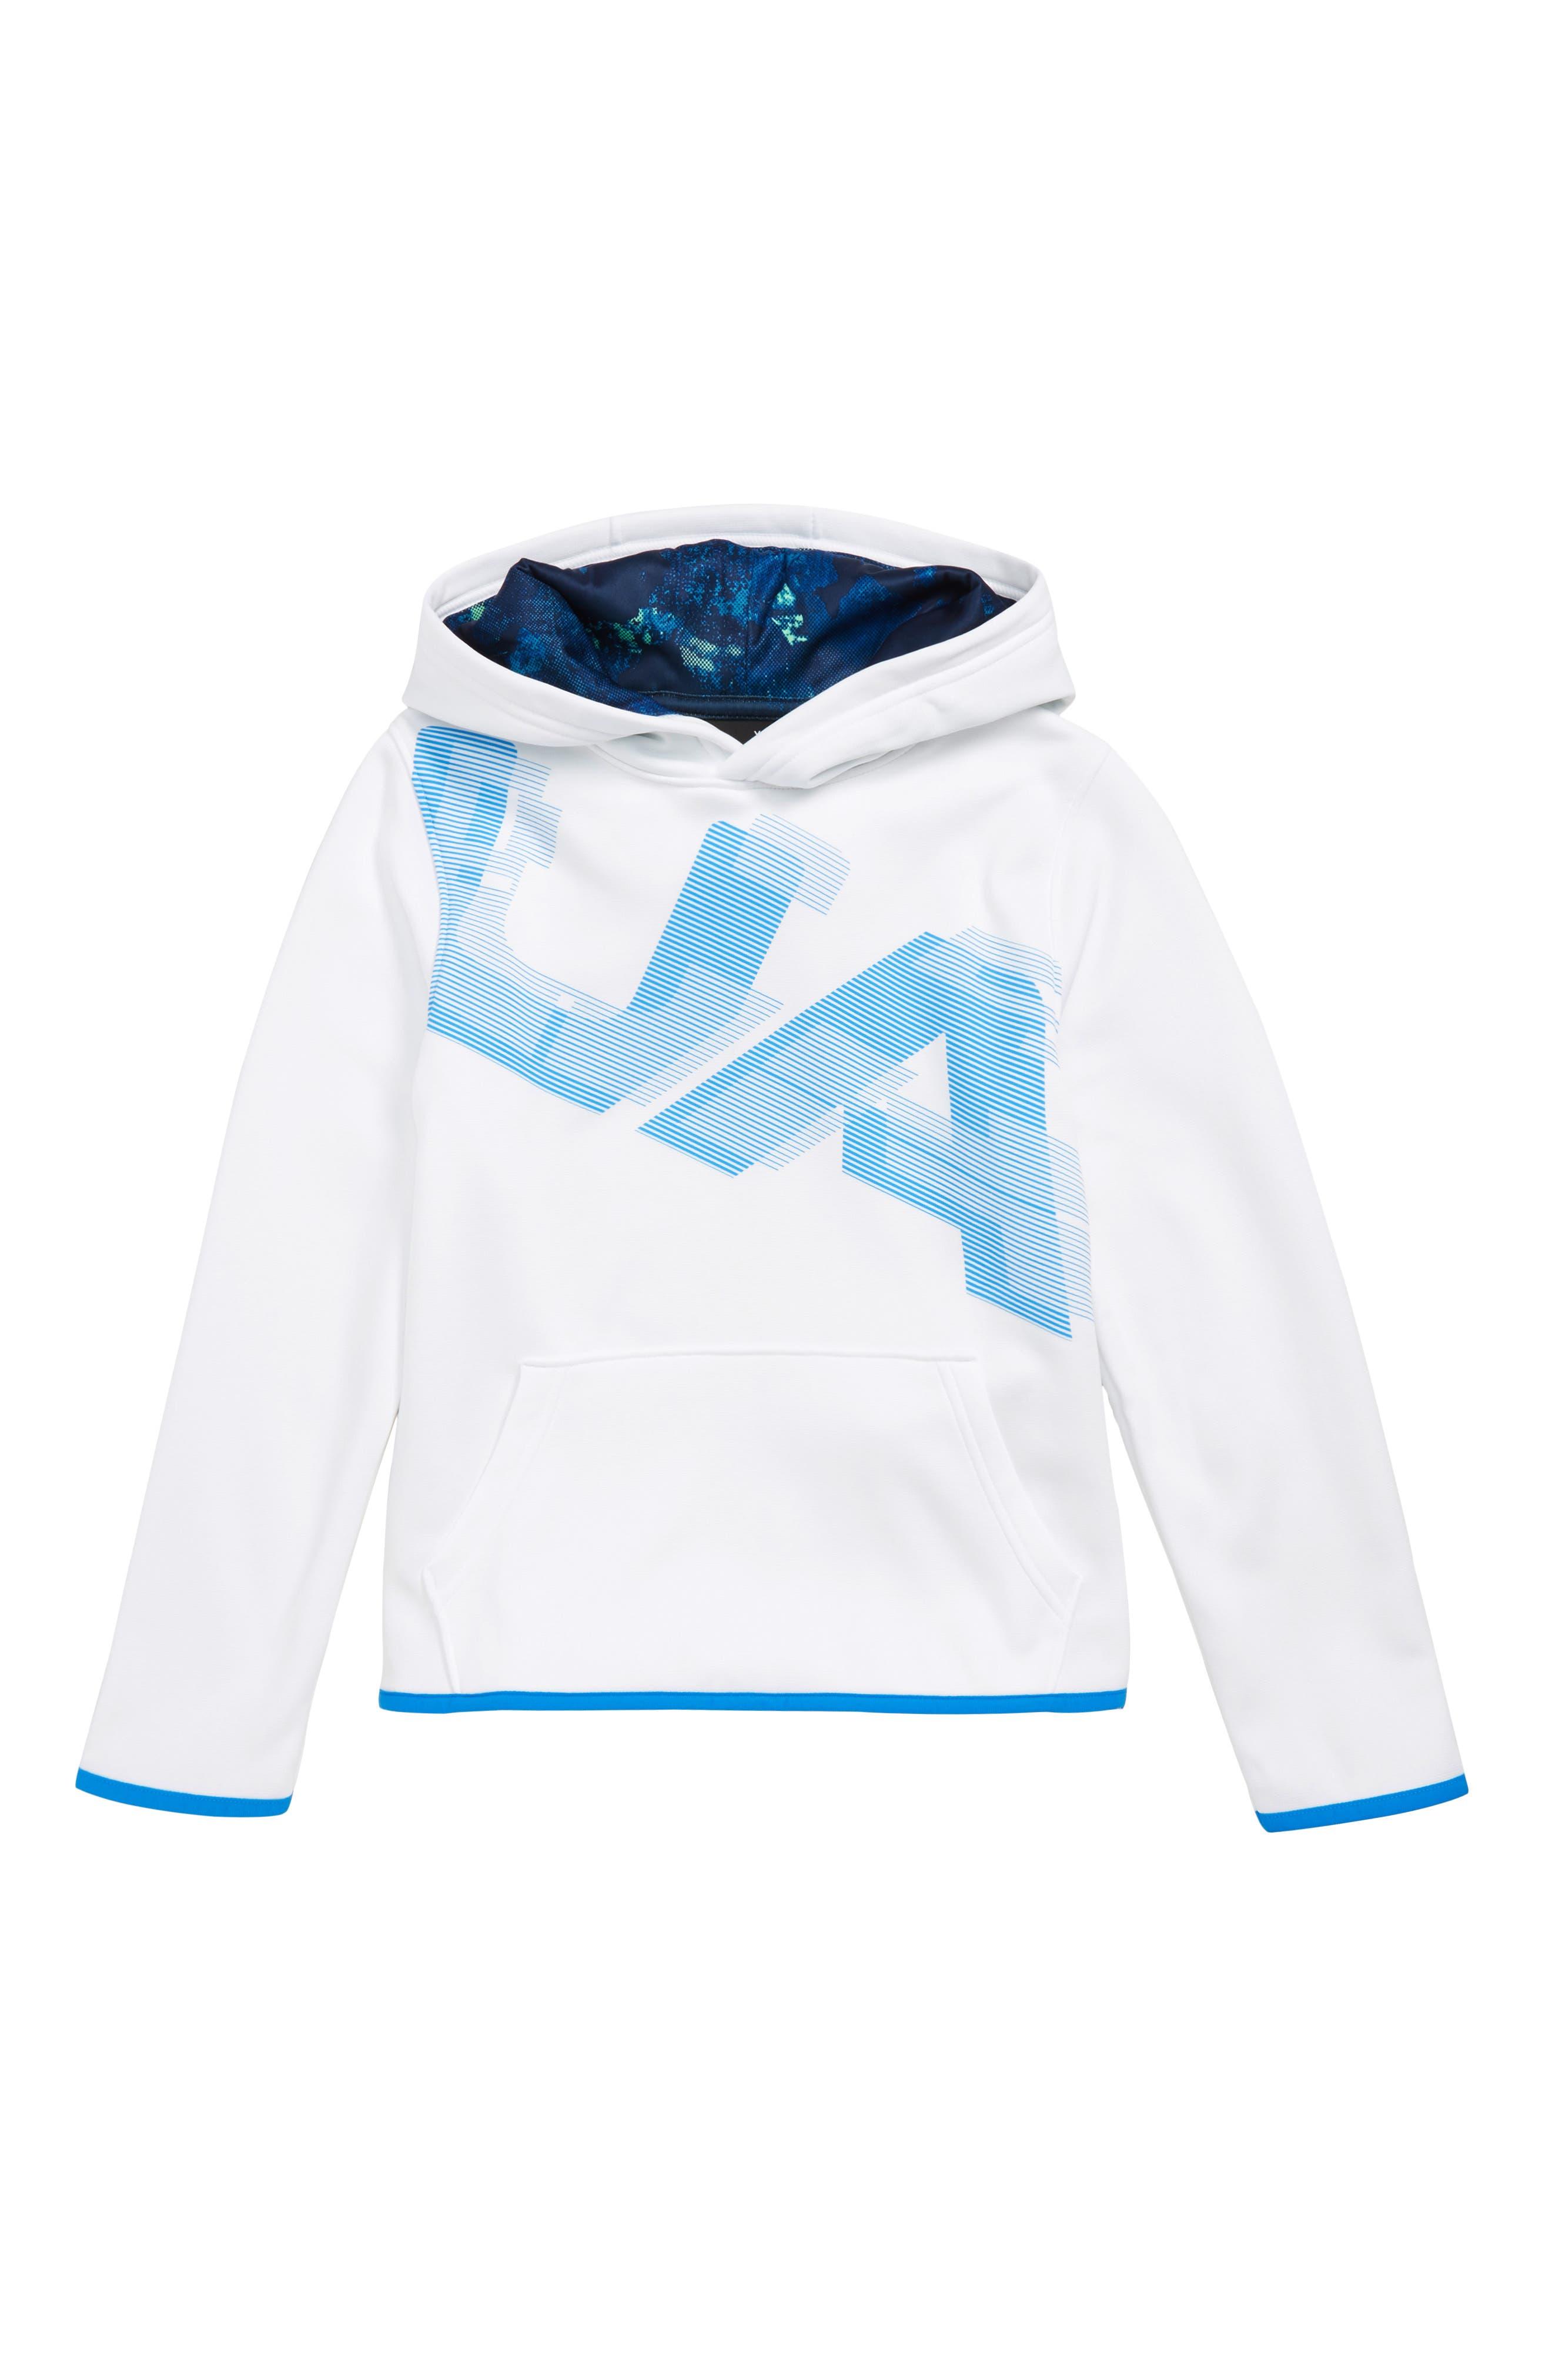 Armour Fleece<sup>®</sup> Logo Graphic Hoodie,                             Main thumbnail 1, color,                             WHITE/ BLUE CIRCUIT